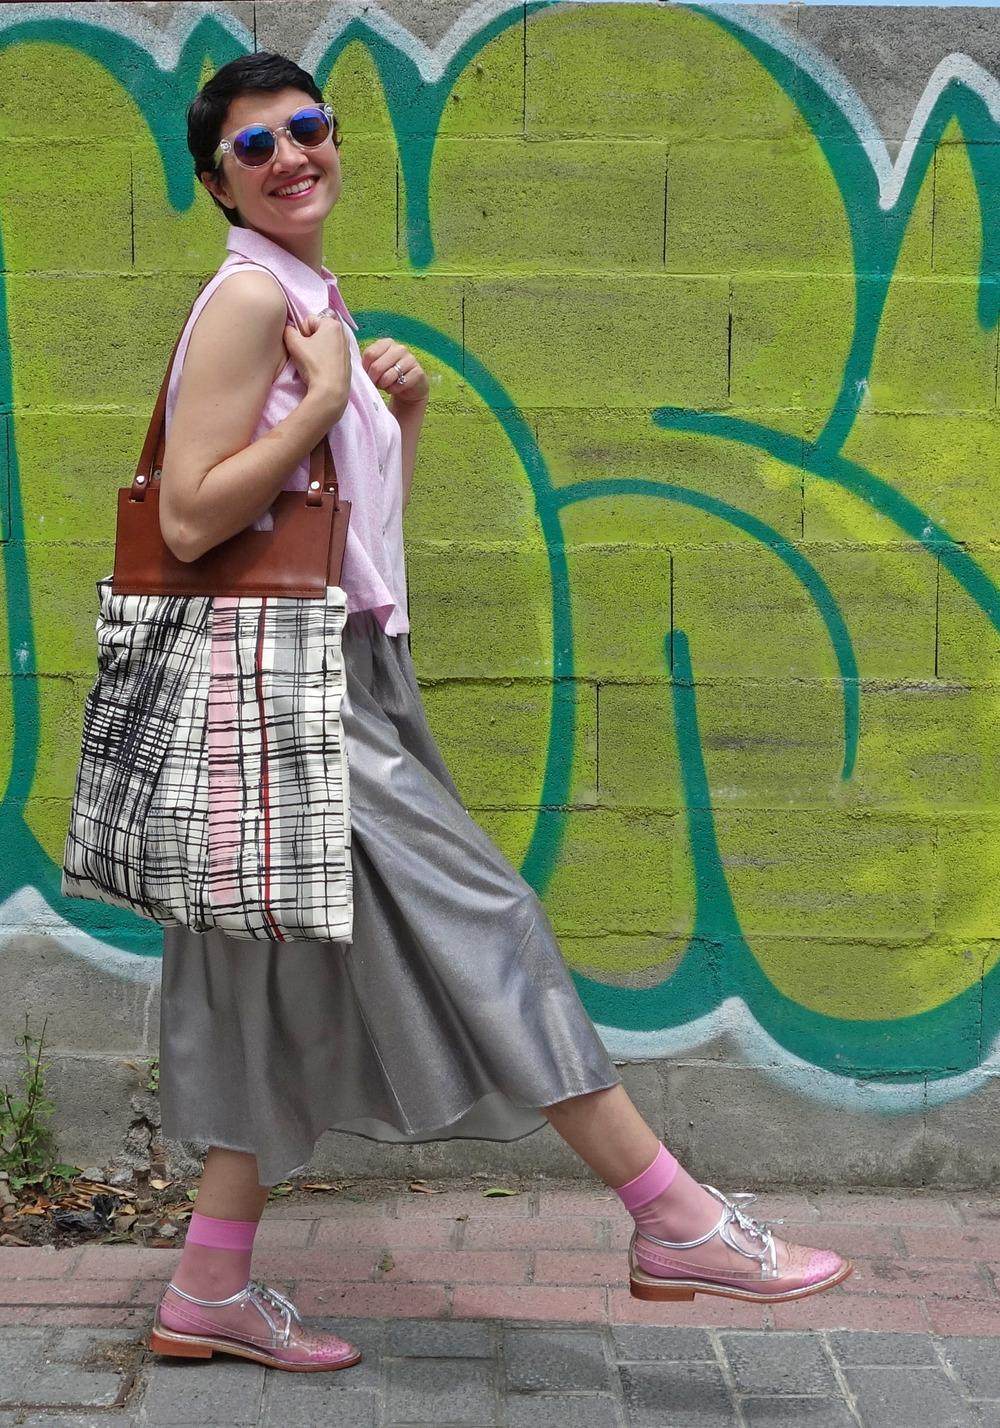 Back_To_Trendy_Airova_Shirt_Silver_Skirt_Transparent_Shoes_7.JPG